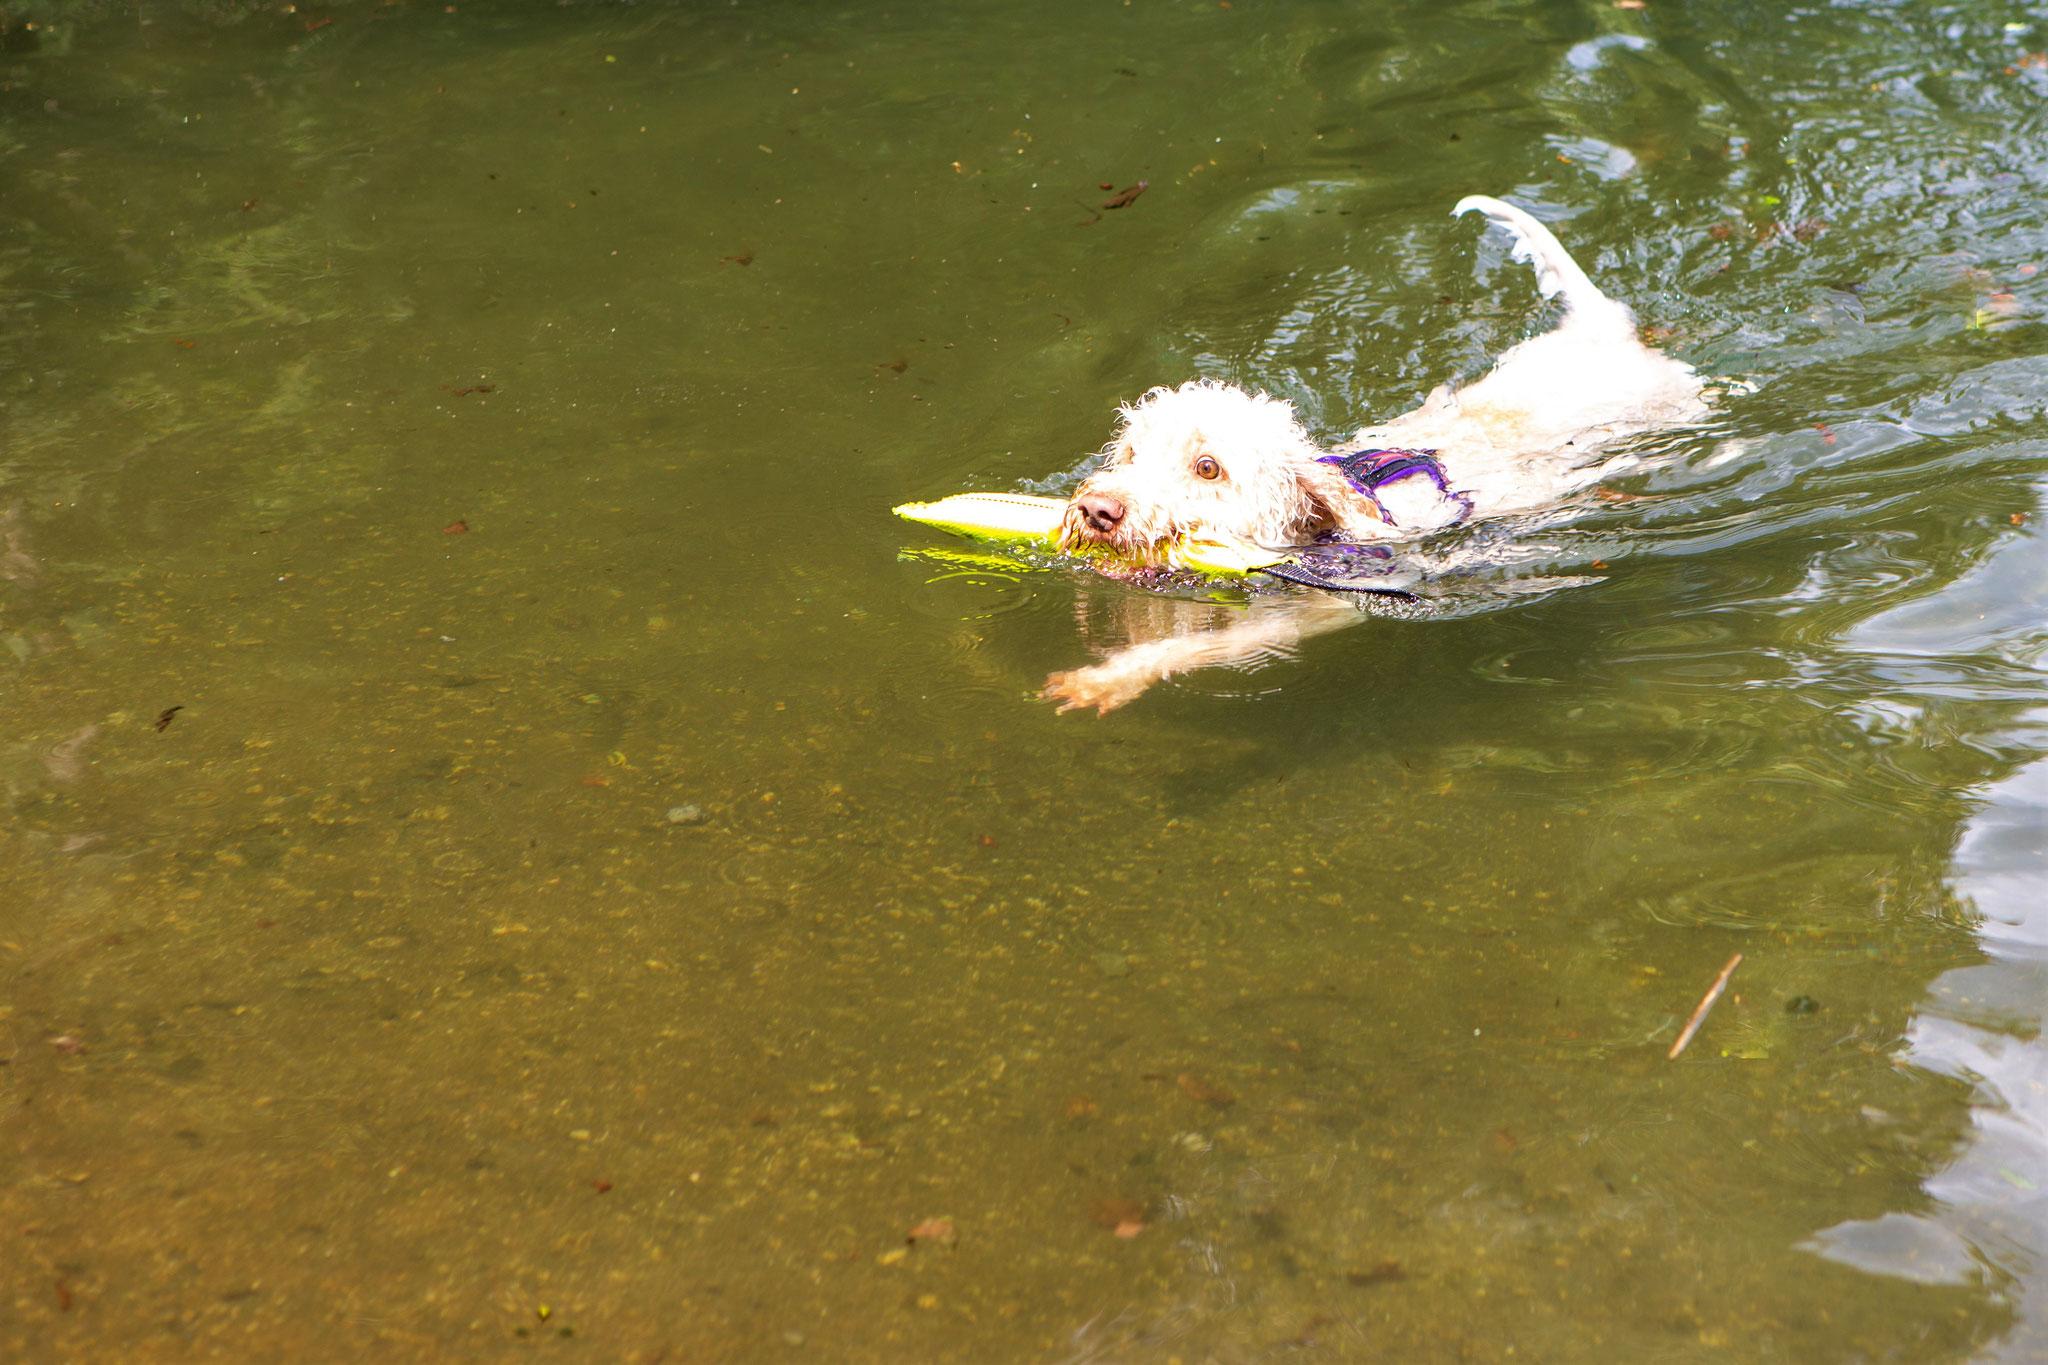 Lovelyn, eine Wasserratte